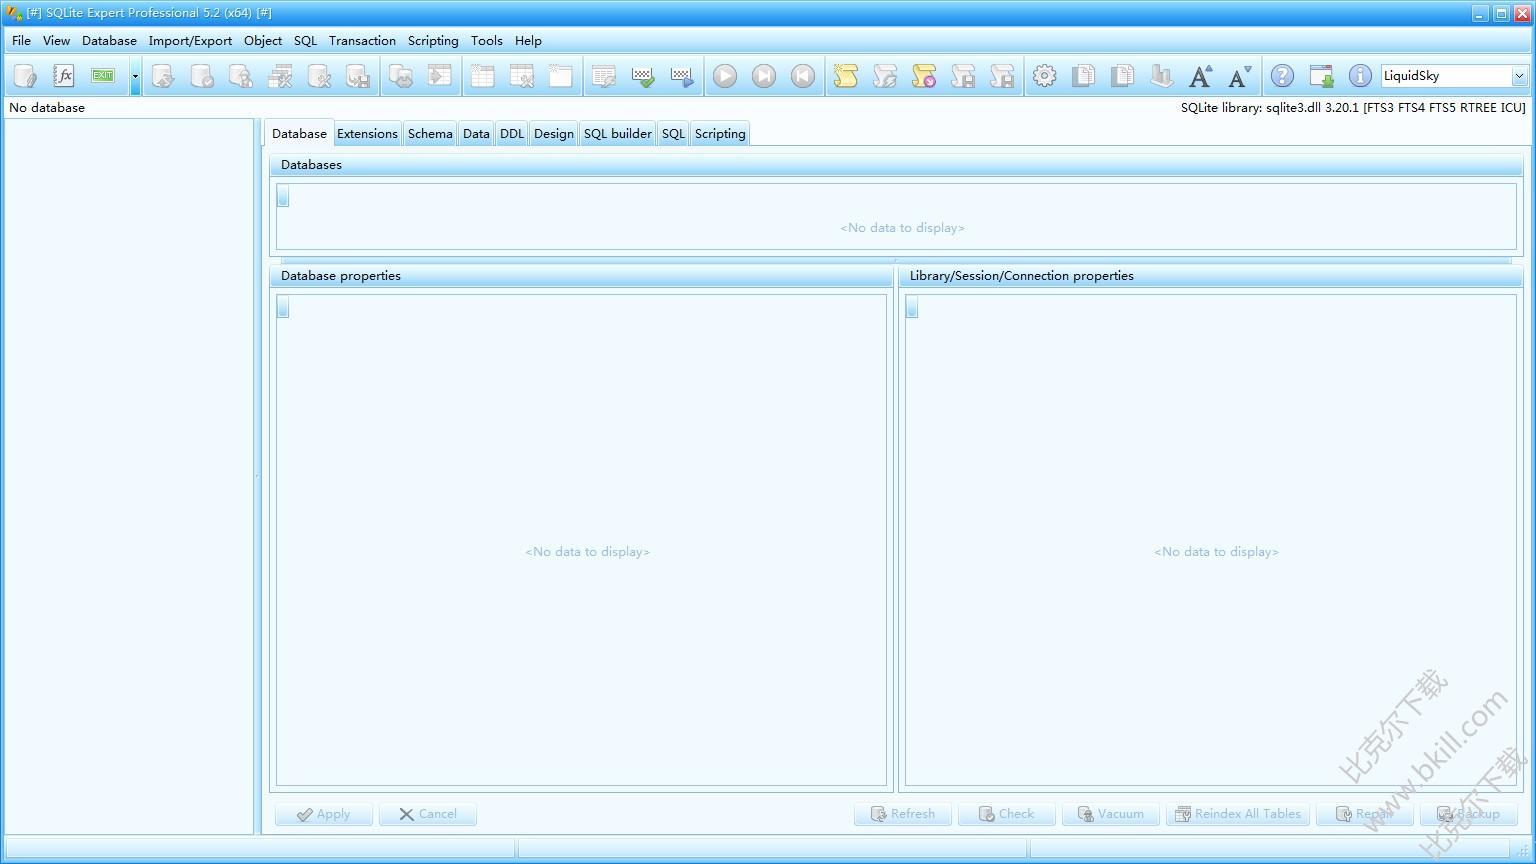 SQLite可视化管理工具(SQLite Expert Professional)